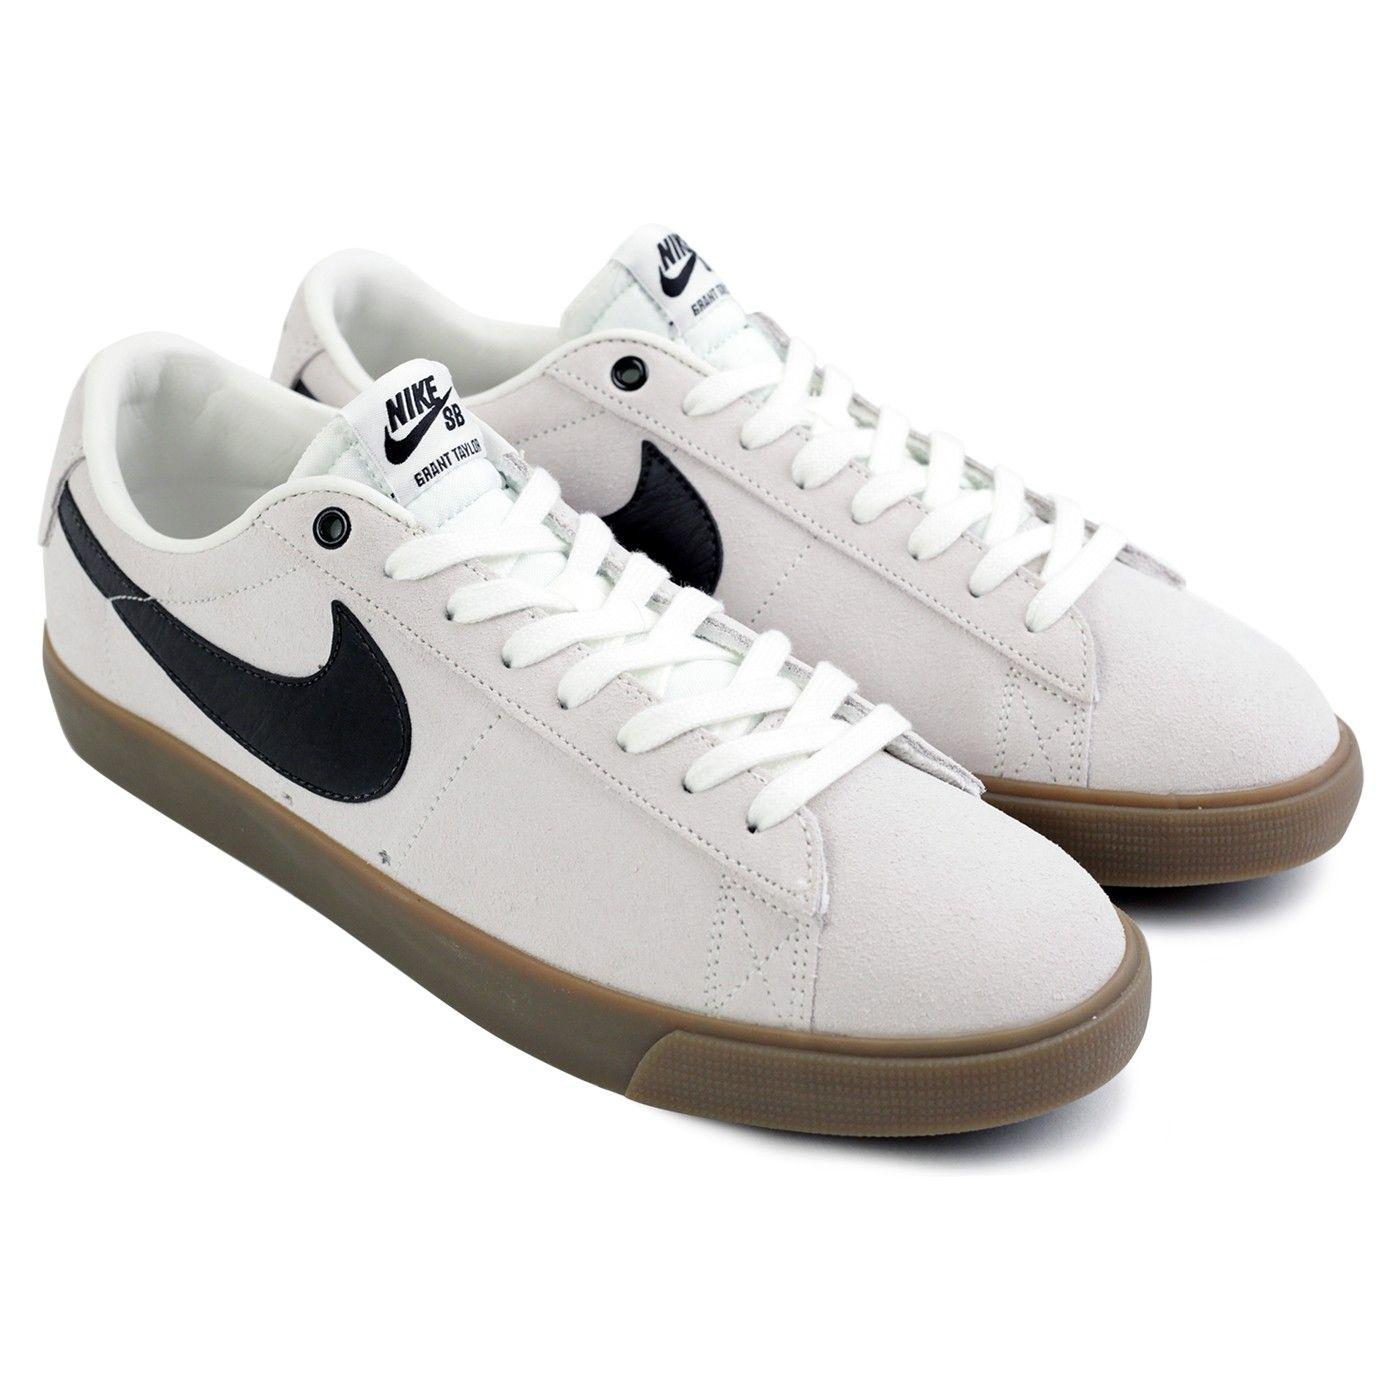 sports shoes e5fb1 1c042 Blazer Low Grant Taylor Shoes in Ivory / Black-Gum Light ...